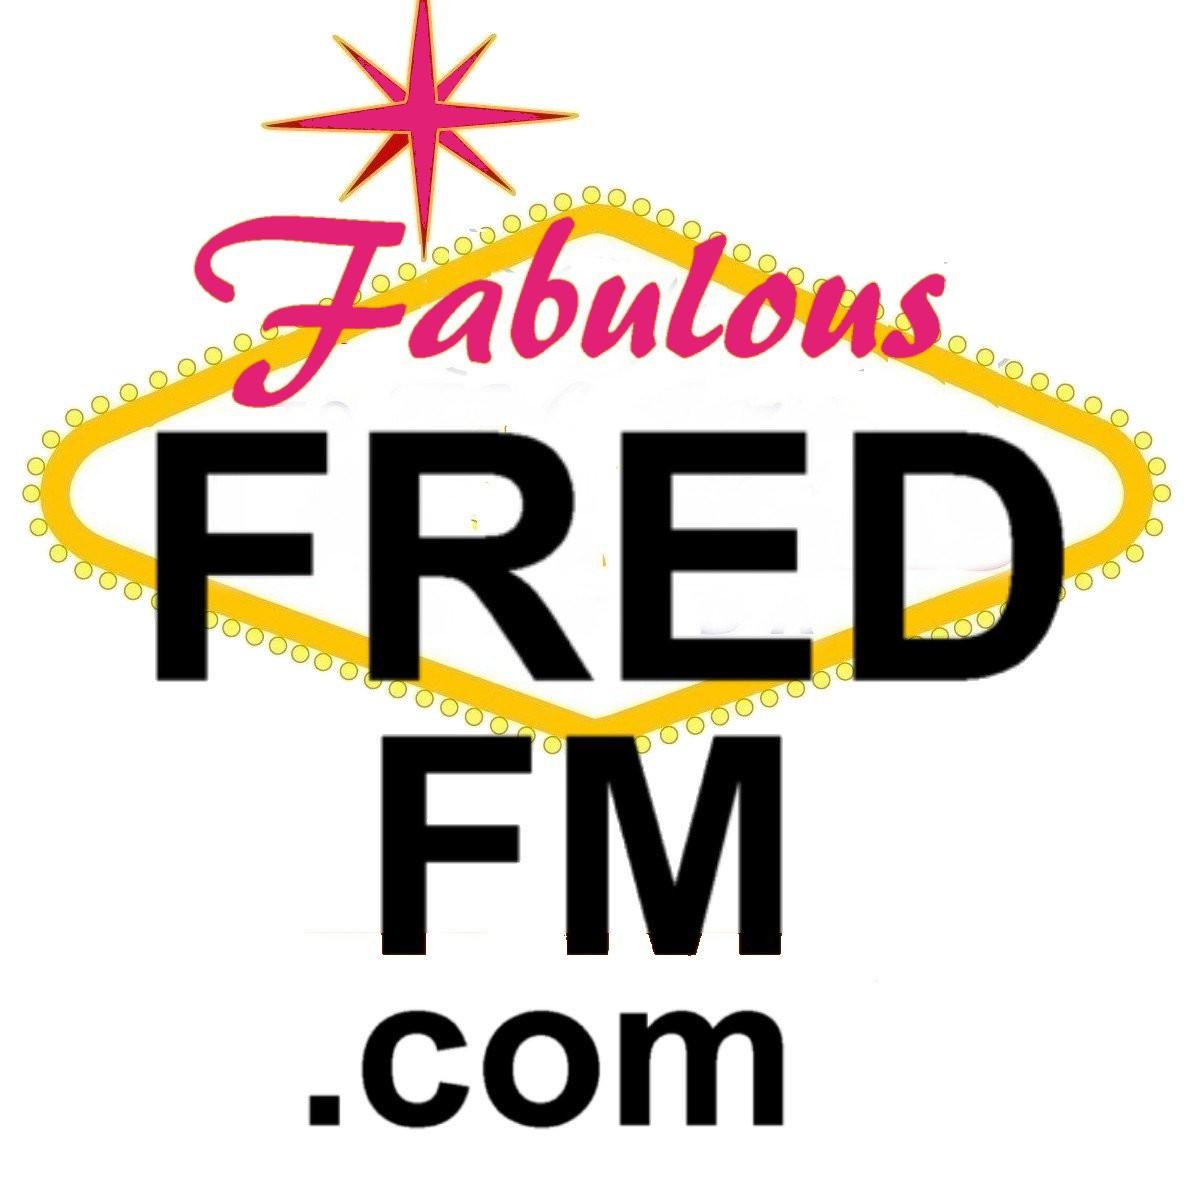 Fabulous Fred FM Rev 2